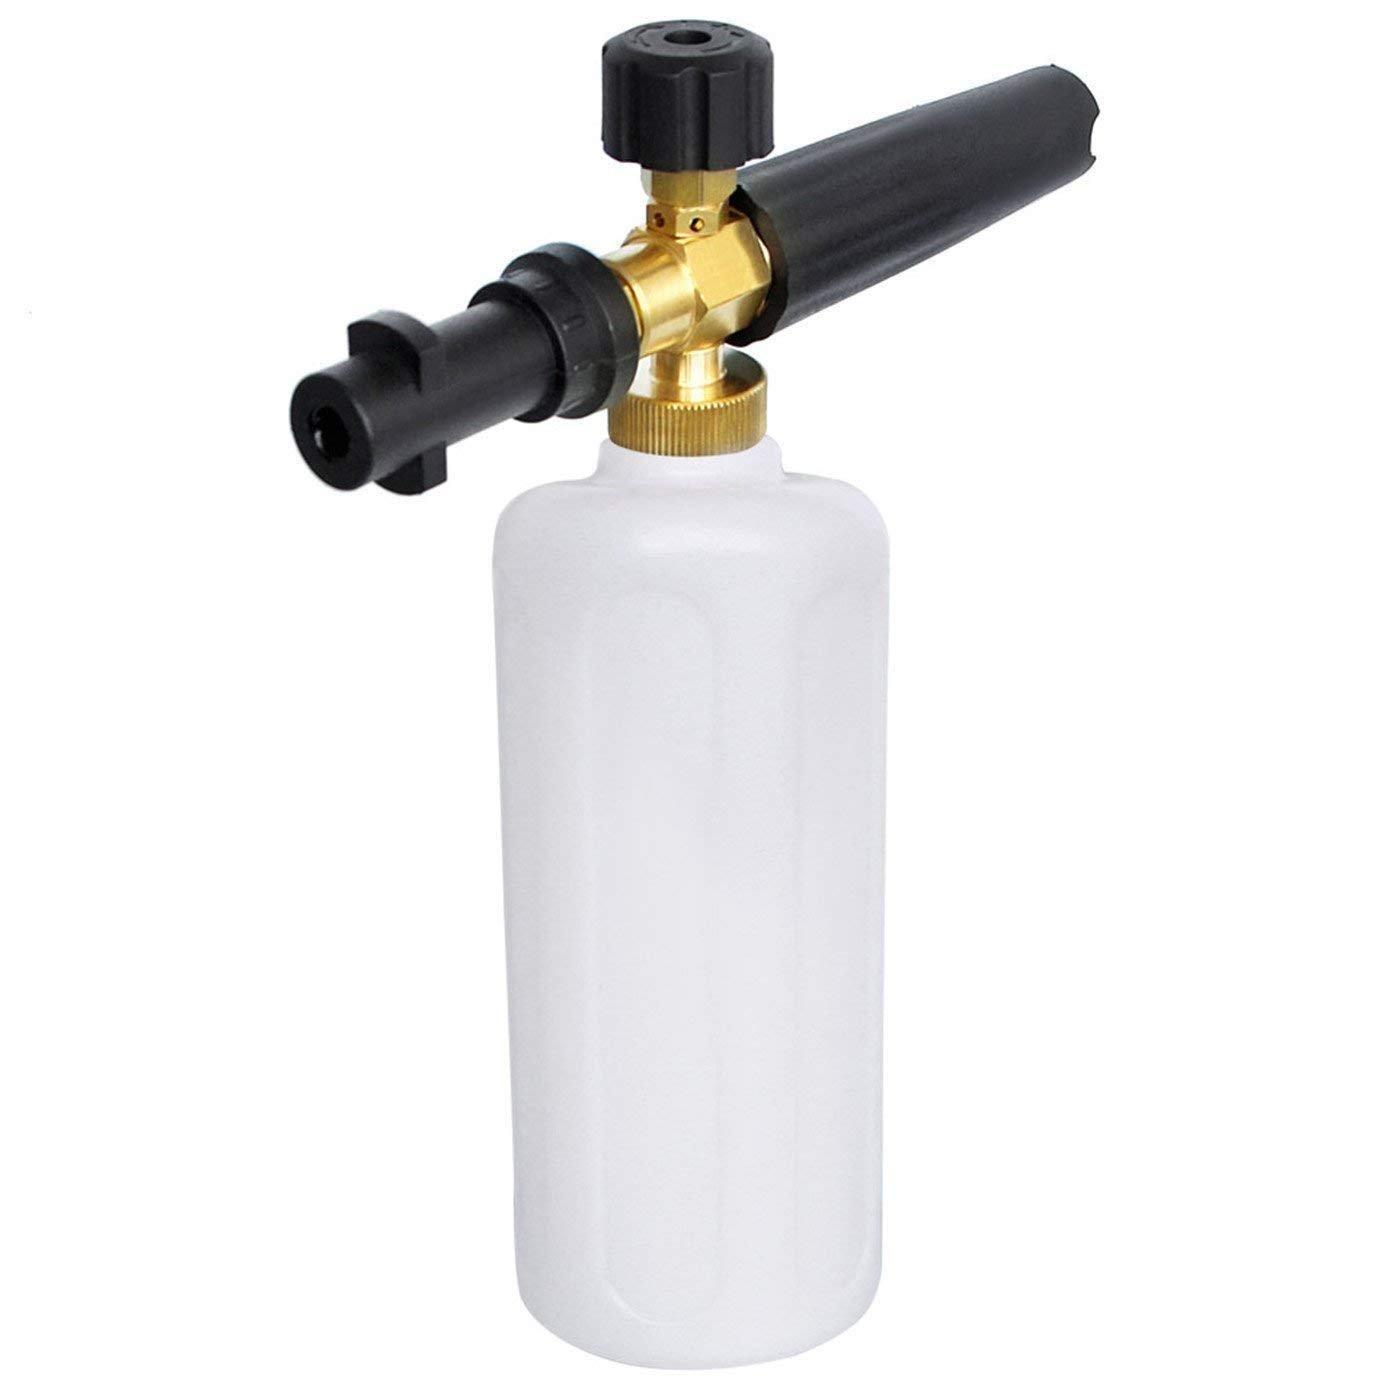 DuckMall Adjustable Foam Cannon Gun for Karcher Snow Foam Lance Adapter Soap Dispenser K Series (K2/K3/K4/K5/K6/K7) Pressure Washer